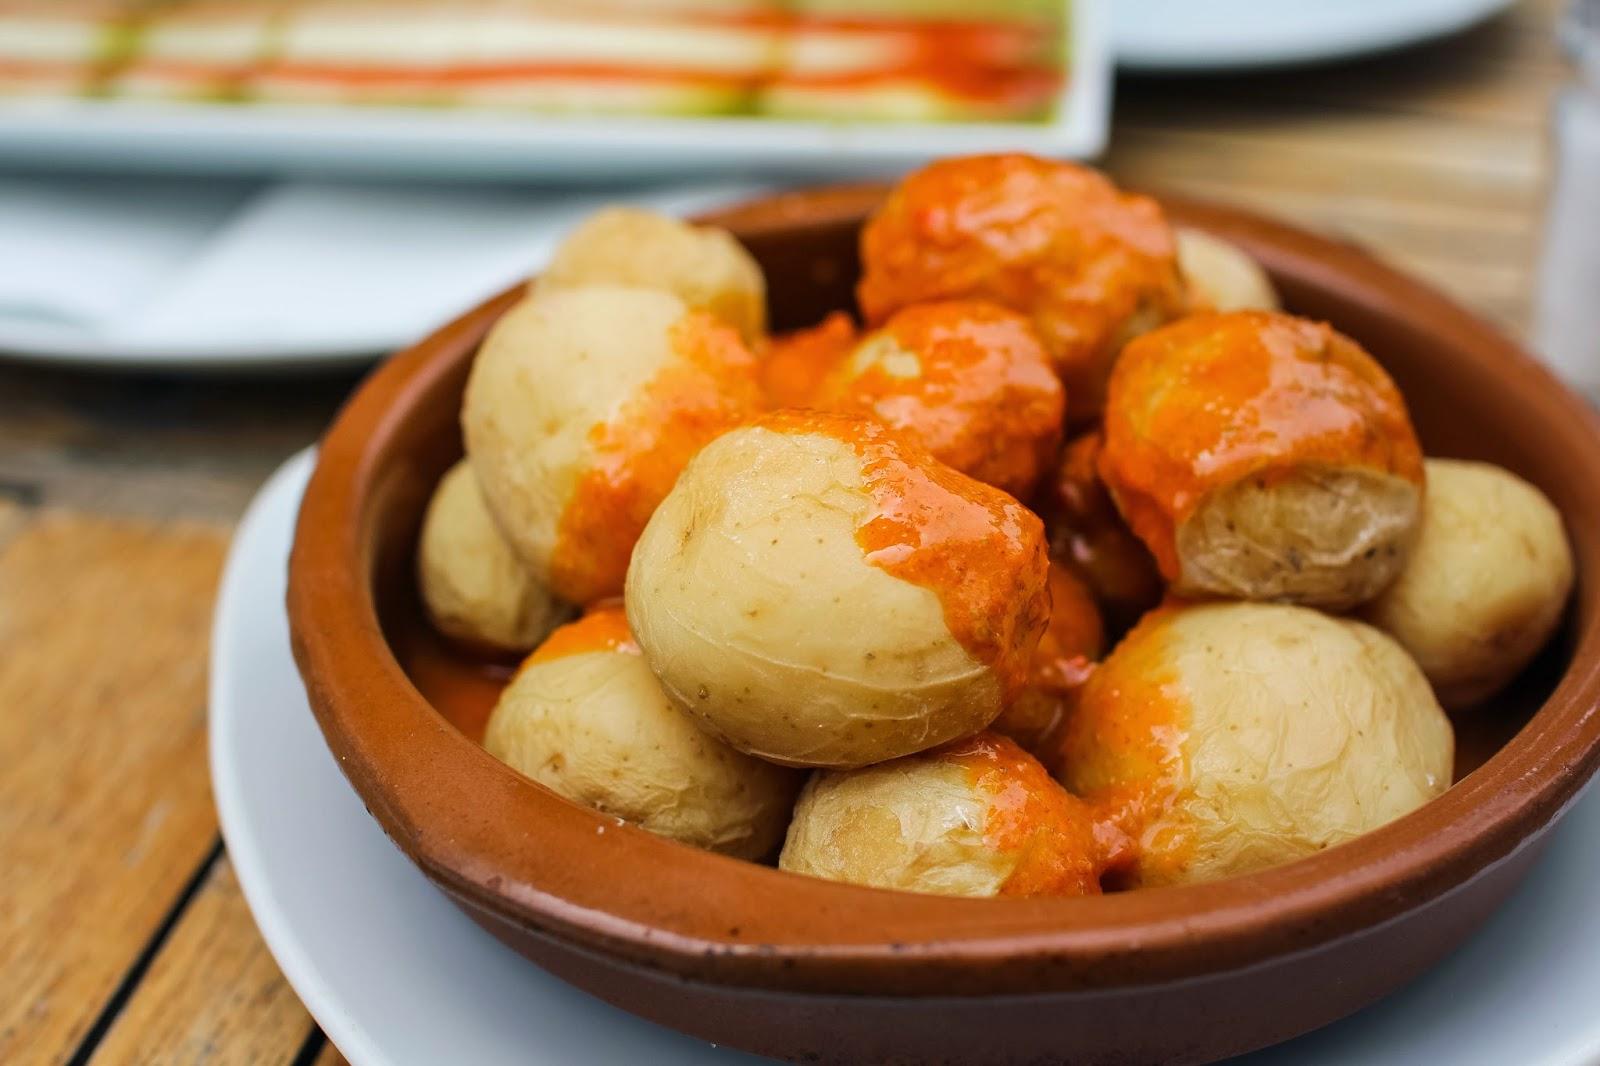 Gluten Free Canary Islands